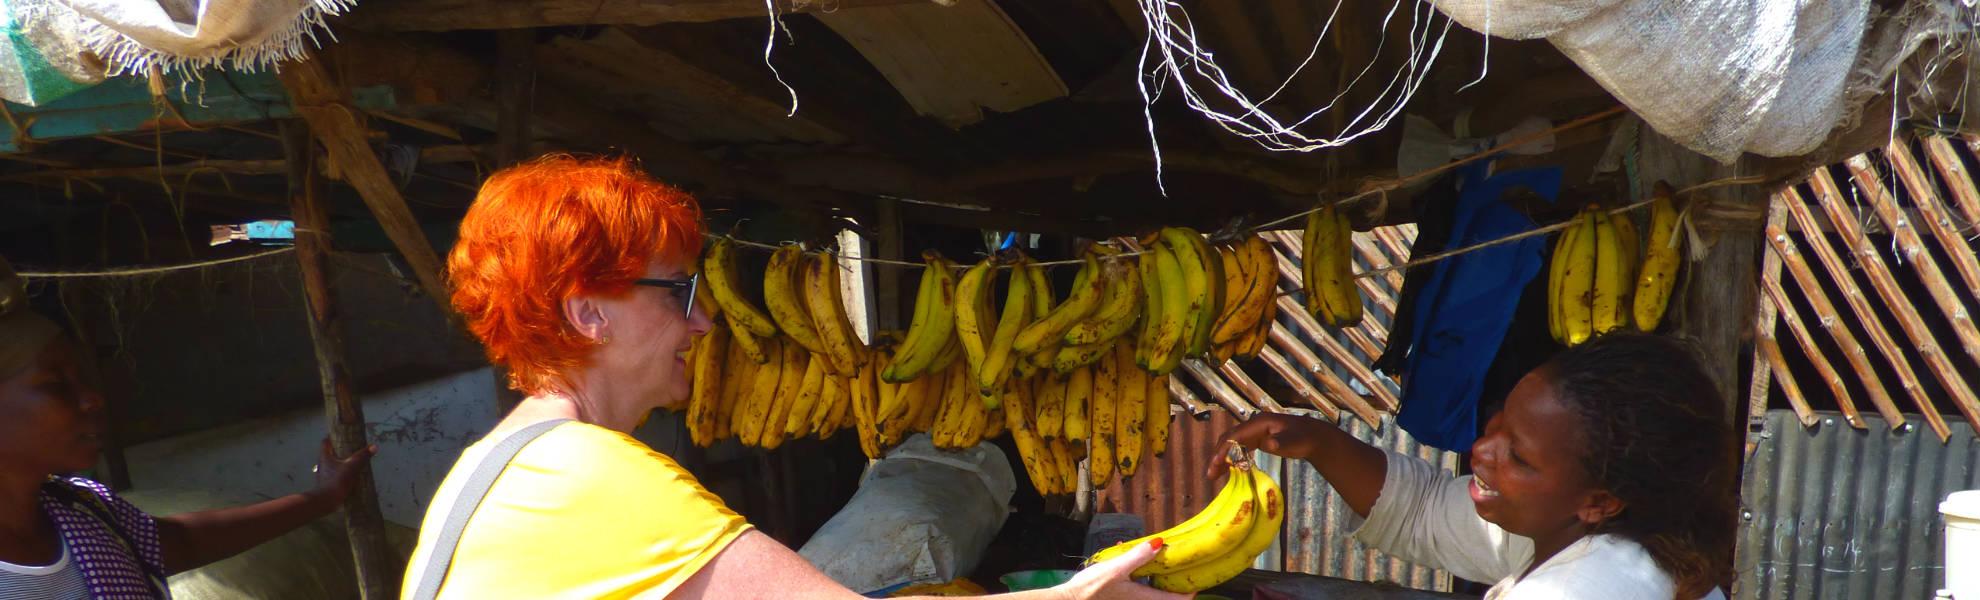 Frau Marina Schmidt kauft Bananen